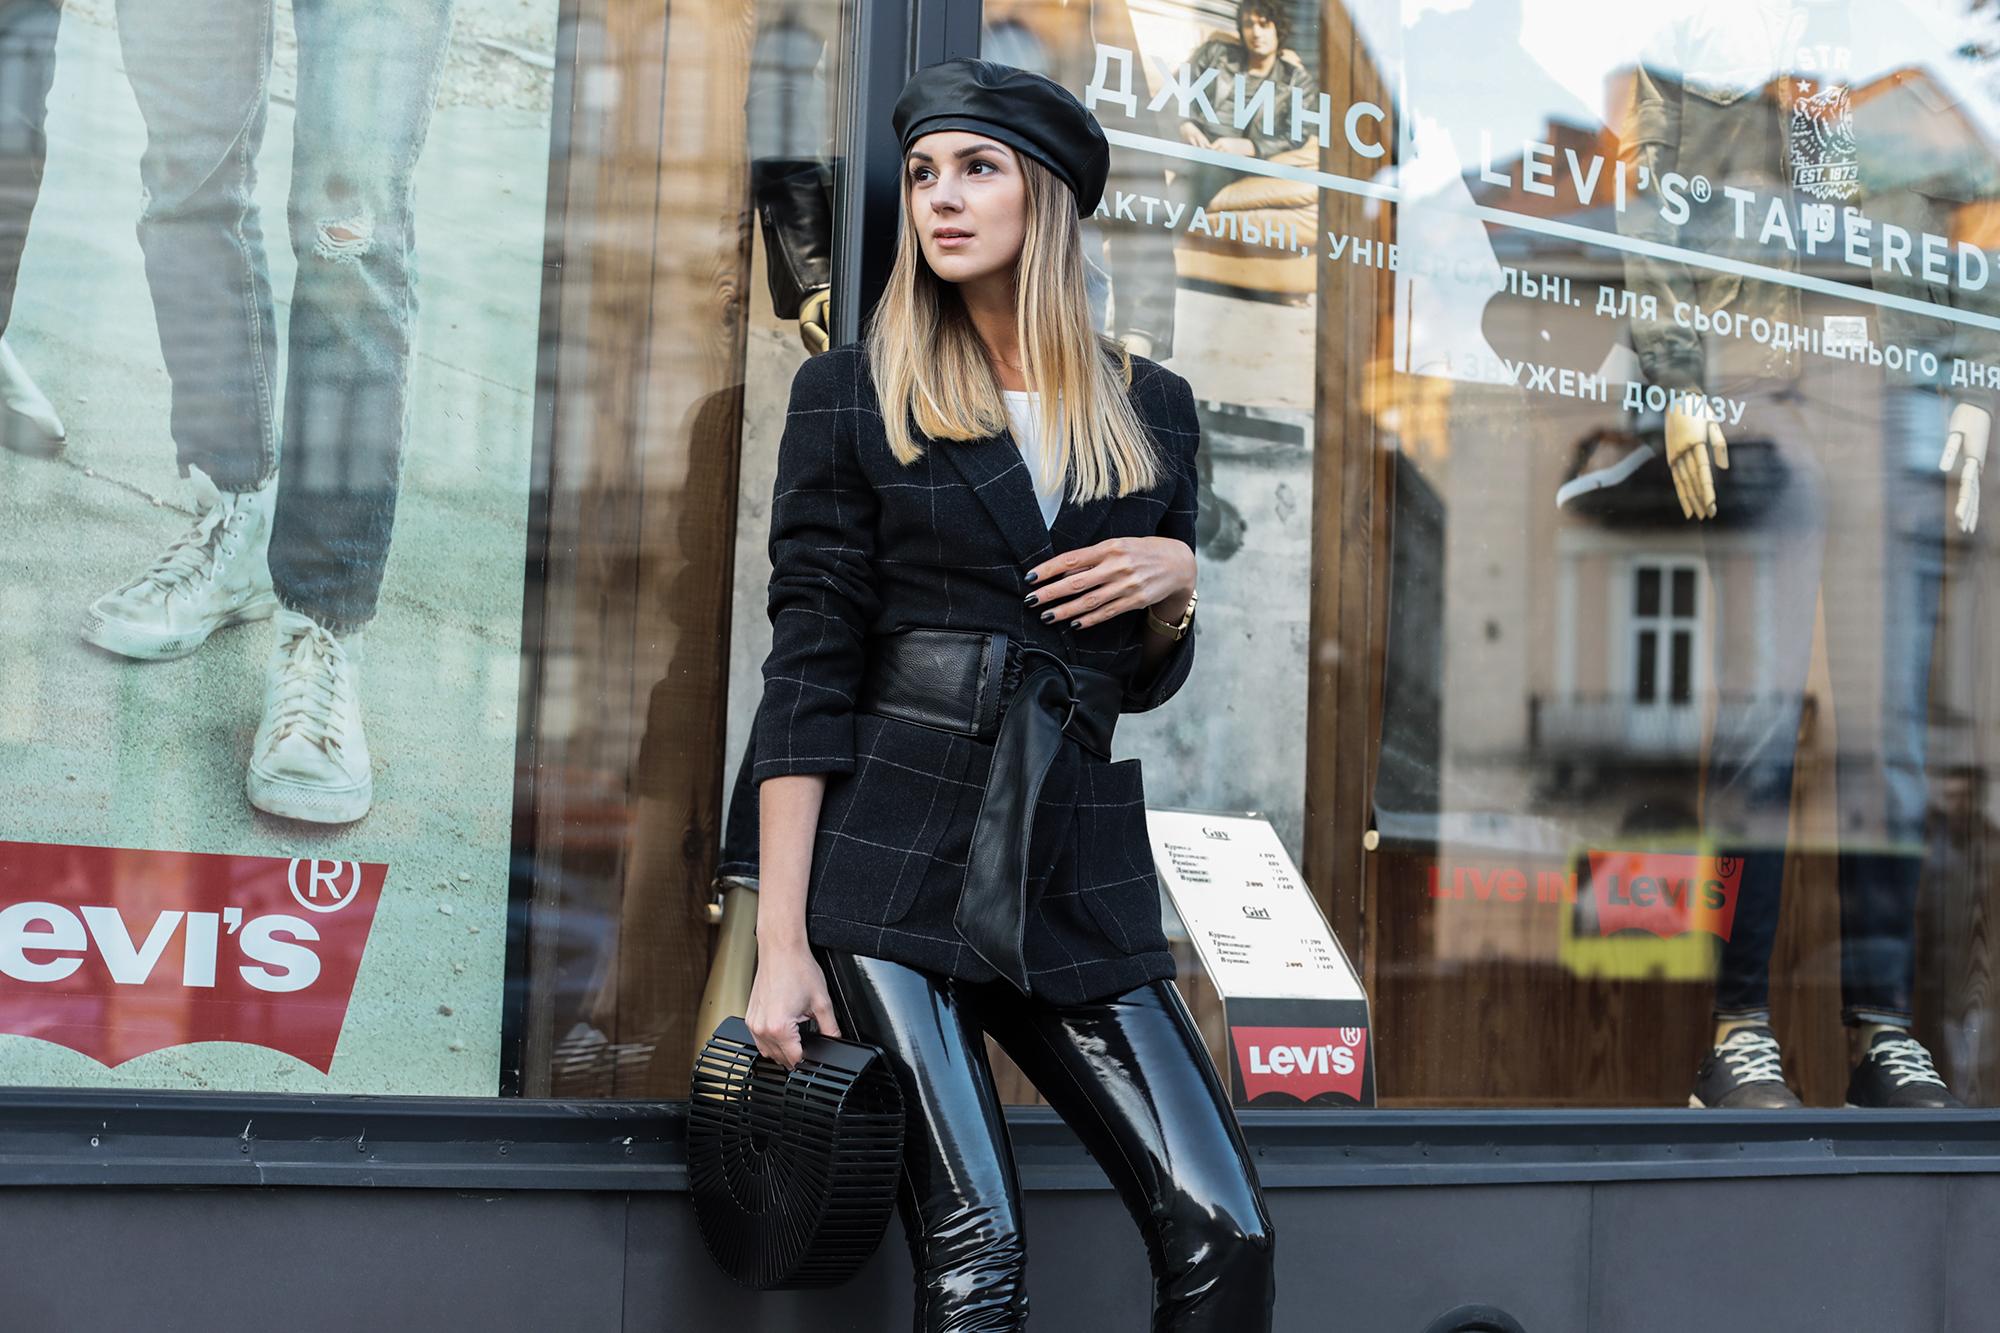 outfit-pantent-leather-pants-vinyl